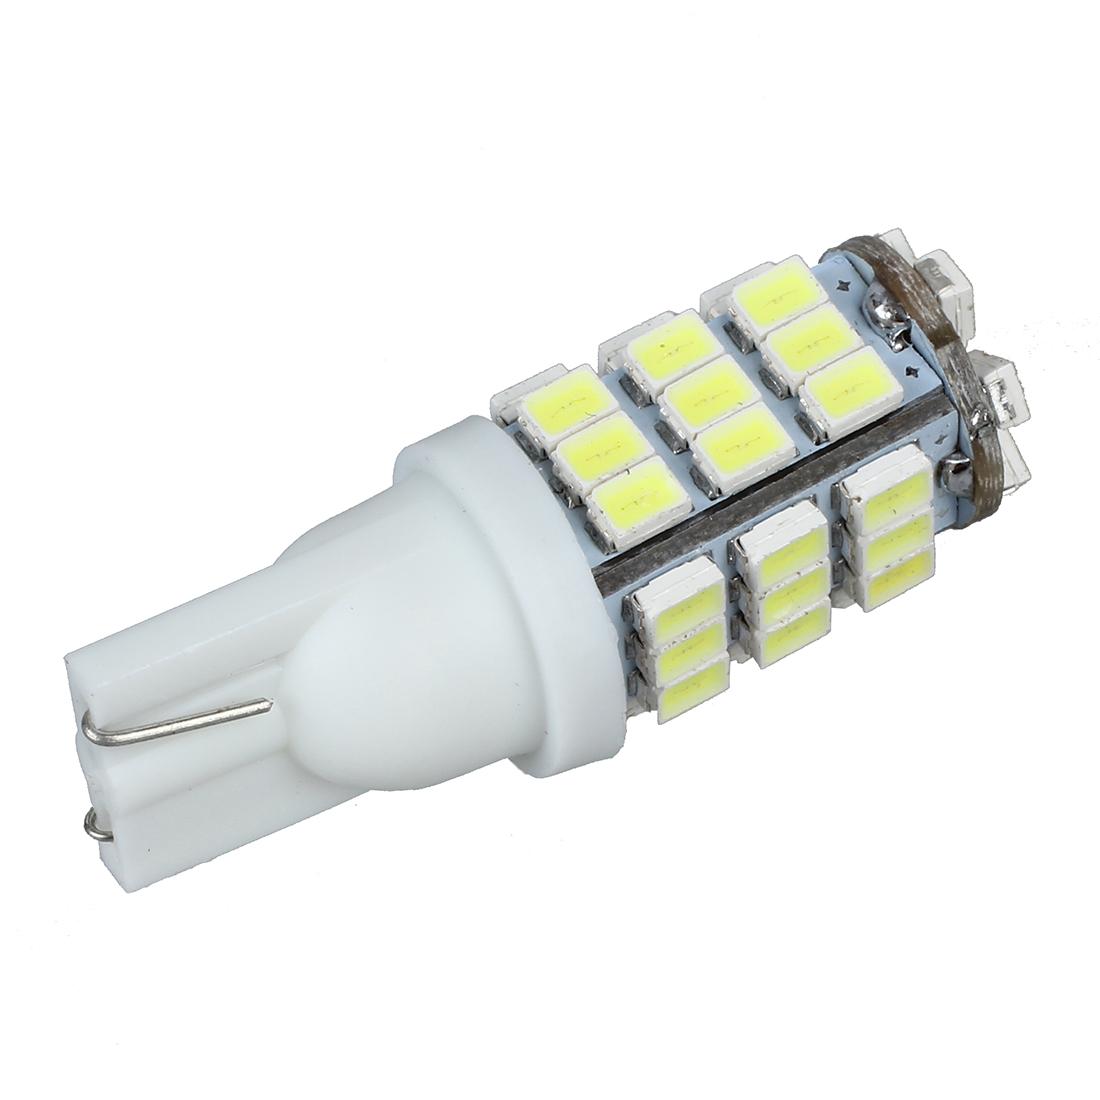 2 pcs auto car t10 w5w 42 smd led white side wedge light - Ampoule led voiture h7 ...